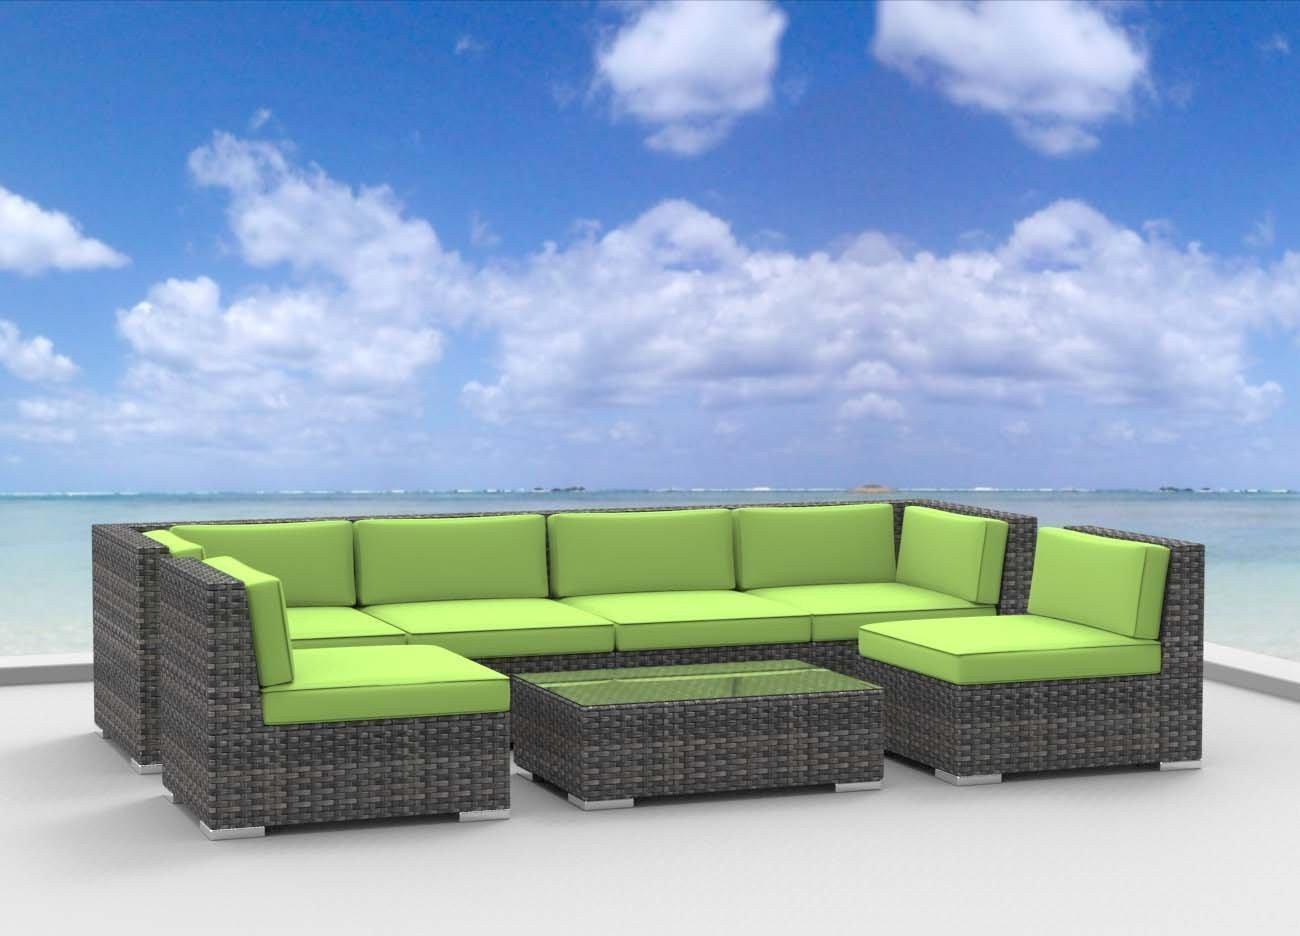 Urban Furnishing.net - OAHU 7pc Modern Outdoor Wicker Patio Furniture Modular Sofa Sectional Set, Fully Assembled - Lime Green -  - patio-furniture, patio, conversation-sets - 61qRw%2Bb4WwL -